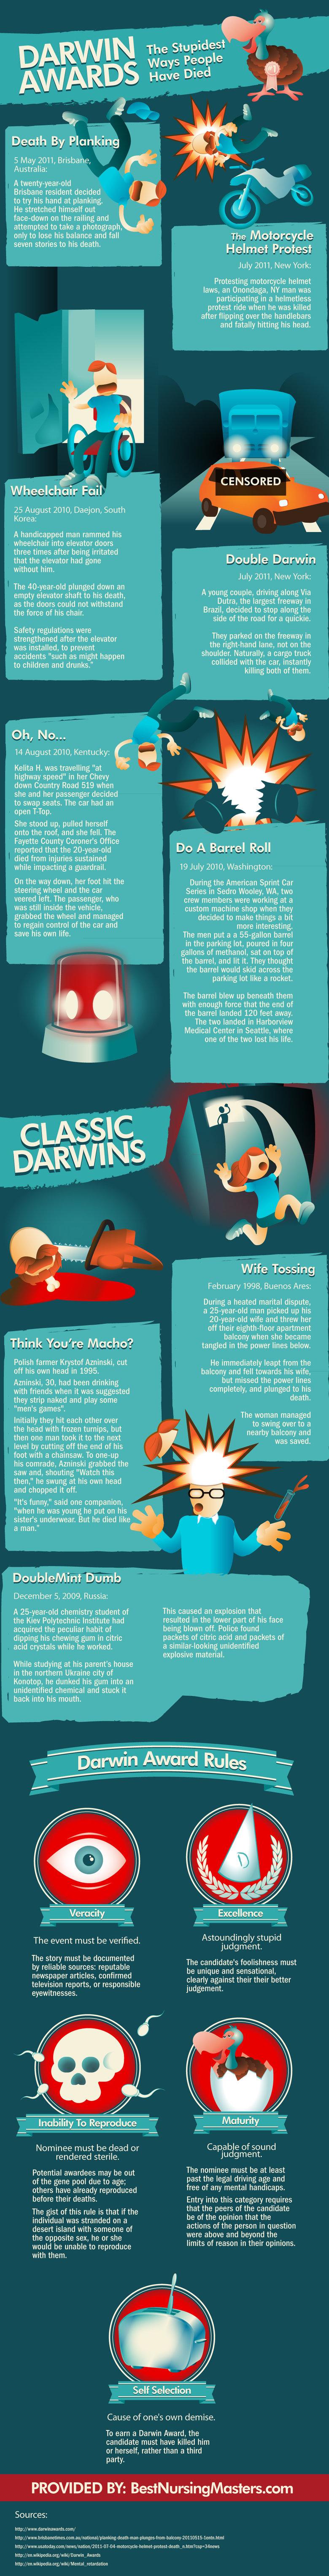 darwwin awards. .